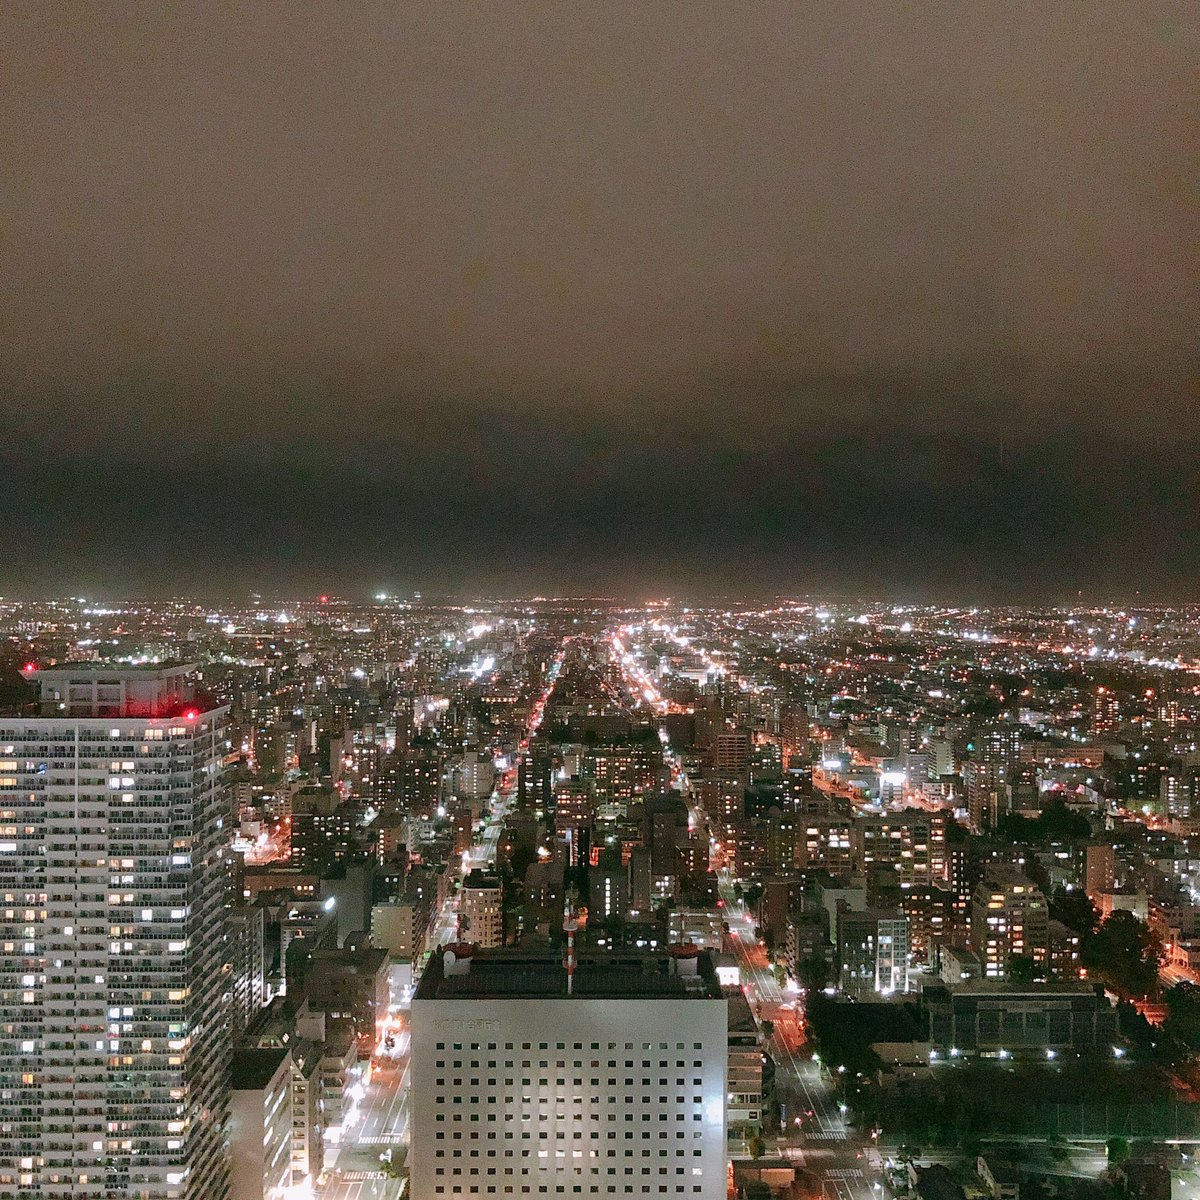 test ツイッターメディア - 連休を取って北海道行ってました◎ 札幌のJRタワーからの夜景  ちなみにこの写真のあと、ふうまくんの写真(カラテンの夜の港のもの)と写真撮って一緒に夜景をみました😍😍(一緒に?) https://t.co/Z45wr0GtDx